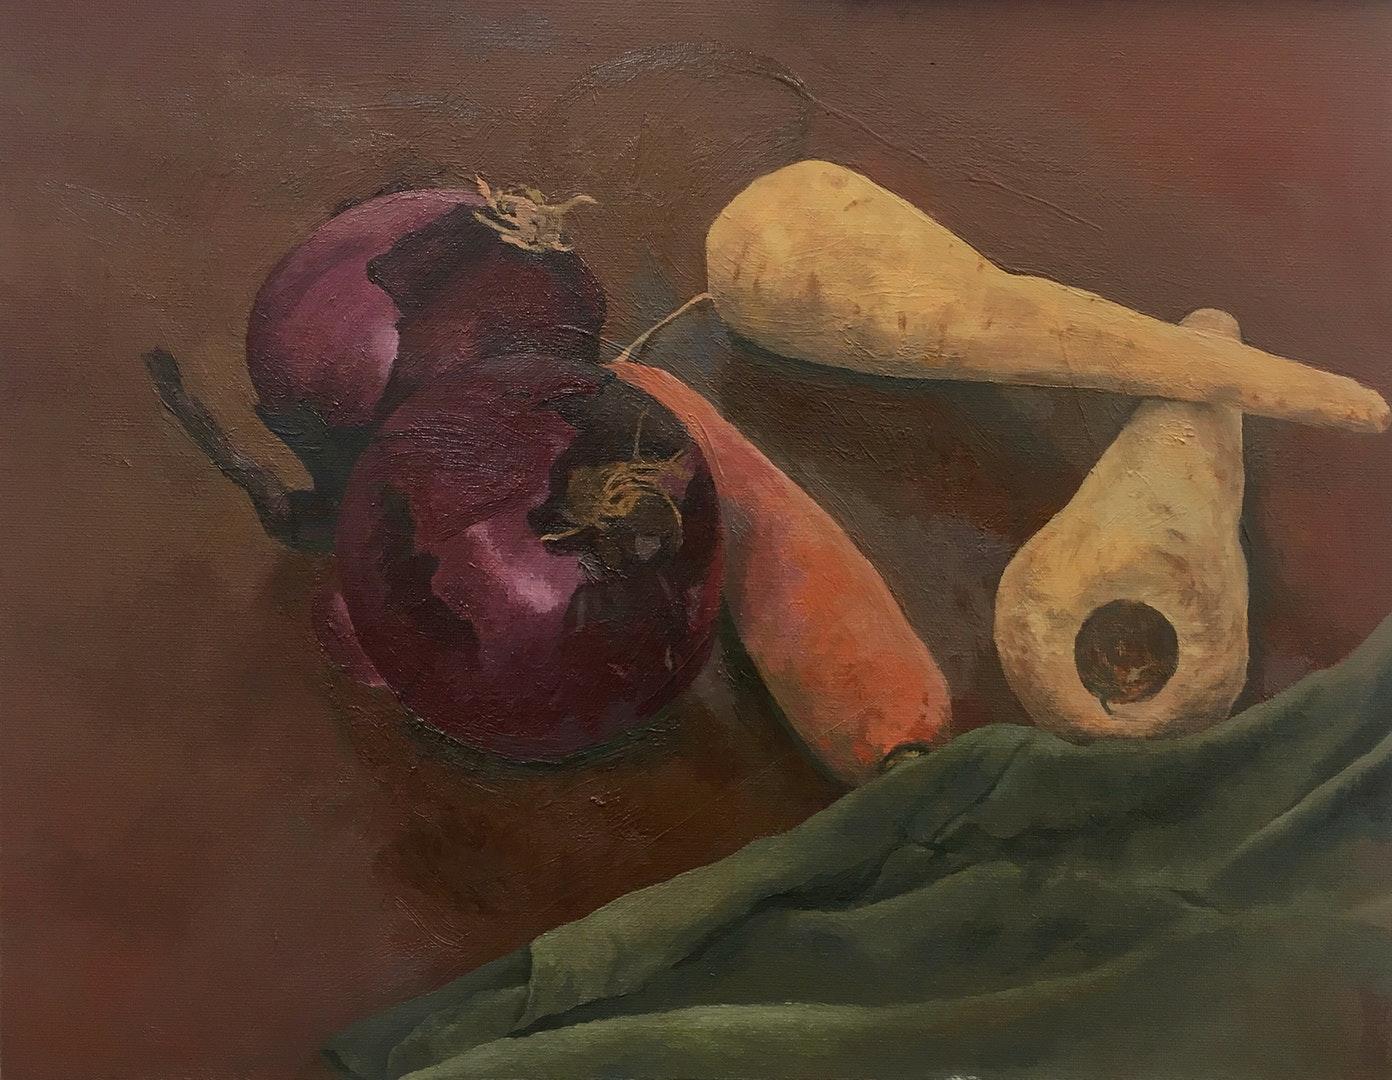 'Still Life of vegetables', Jonathan Farningham, Oil on board, 24 x 30 x 0.5 cm